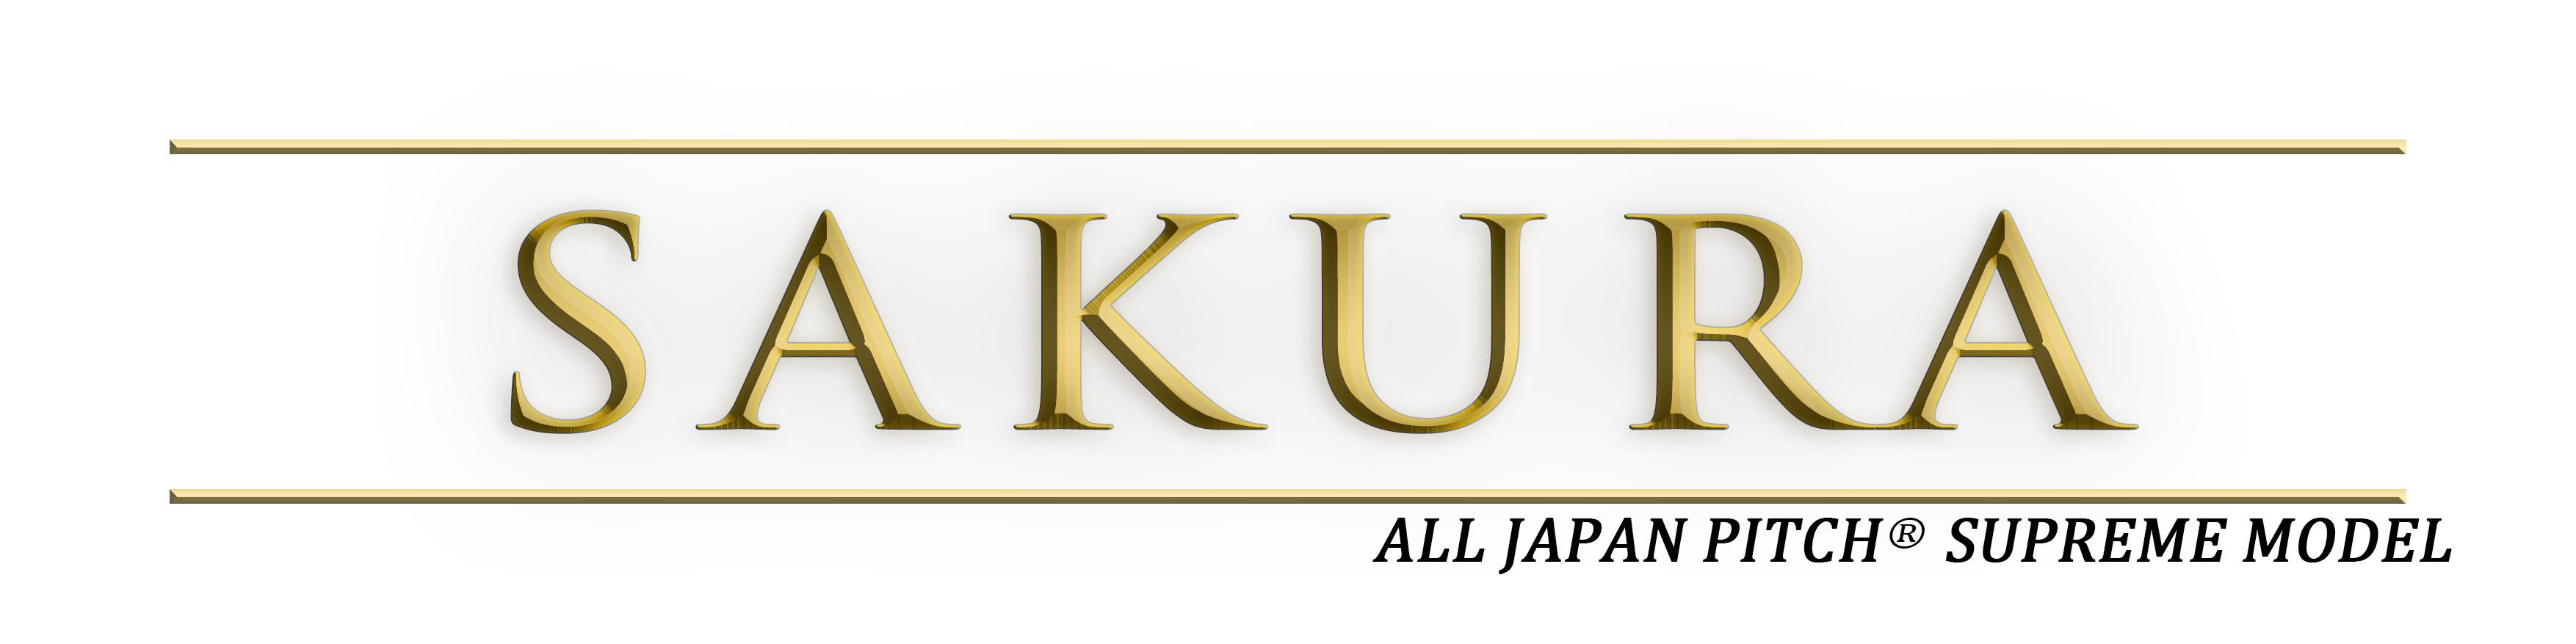 sakura-logo.jpg